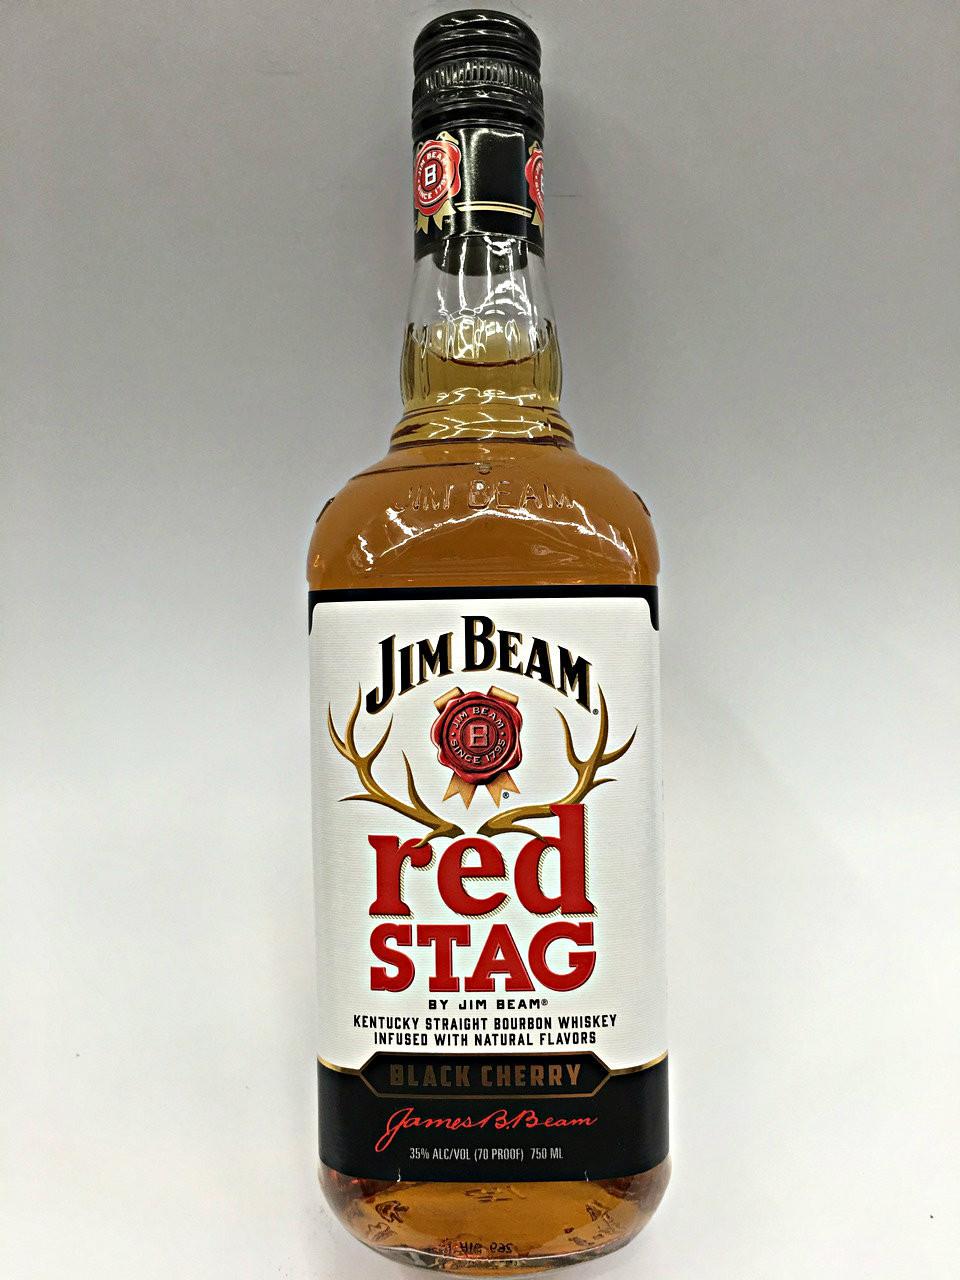 Red Stag Black Cherry By Jim Beam Kentucky Straight